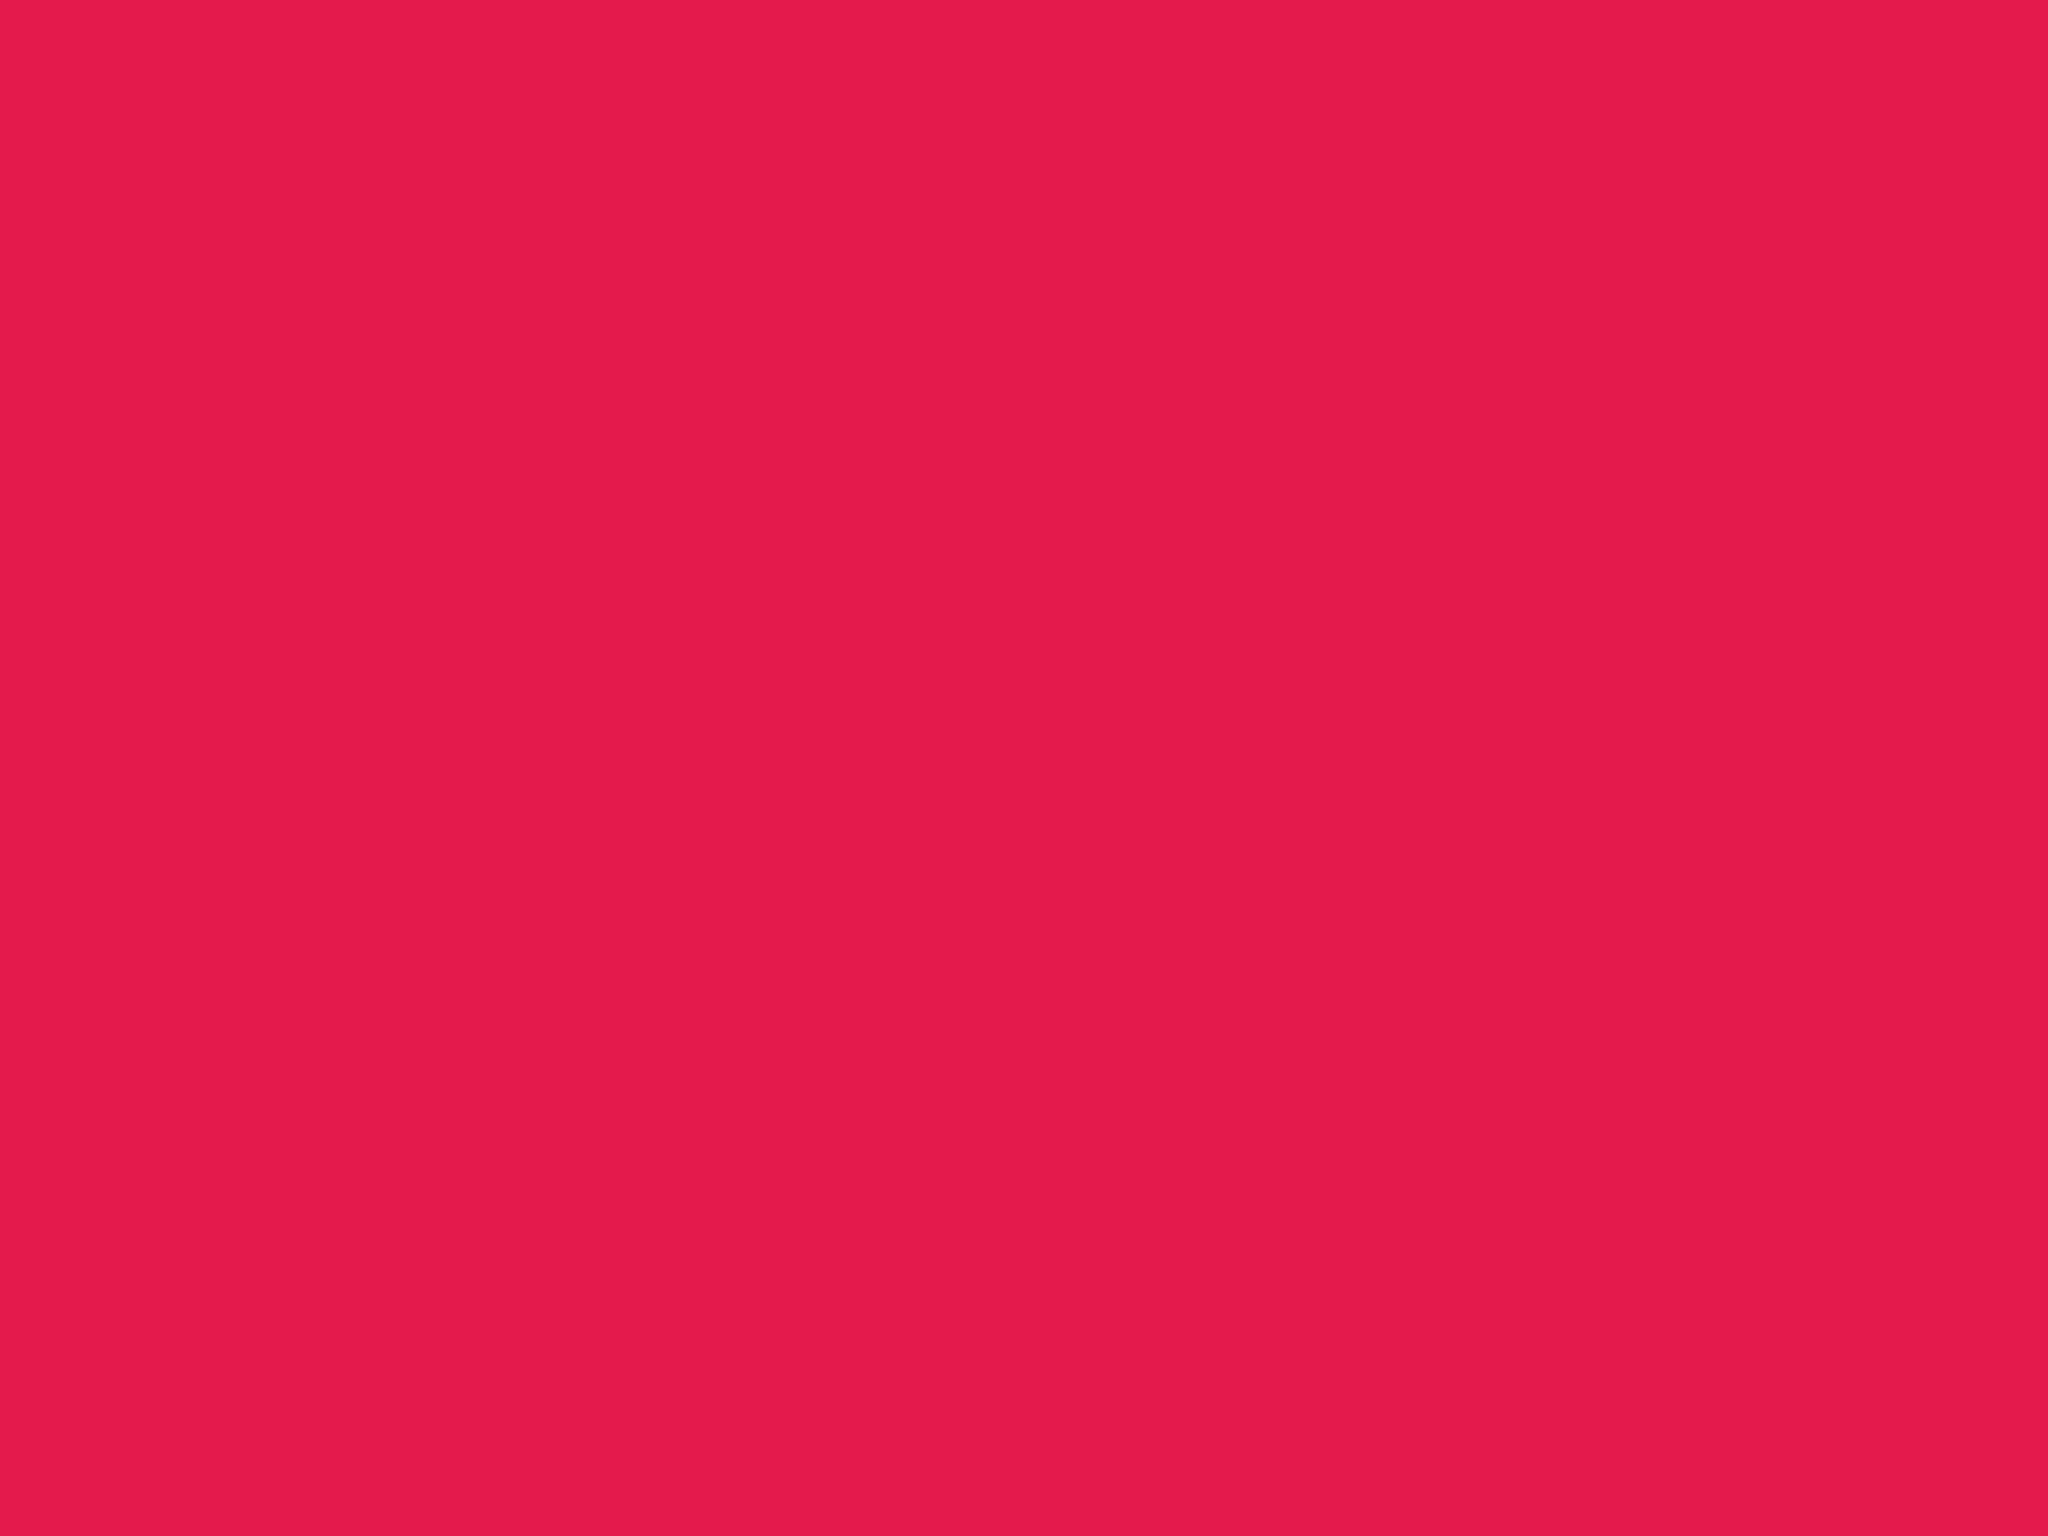 2048x1536 Spanish Crimson Solid Color Background